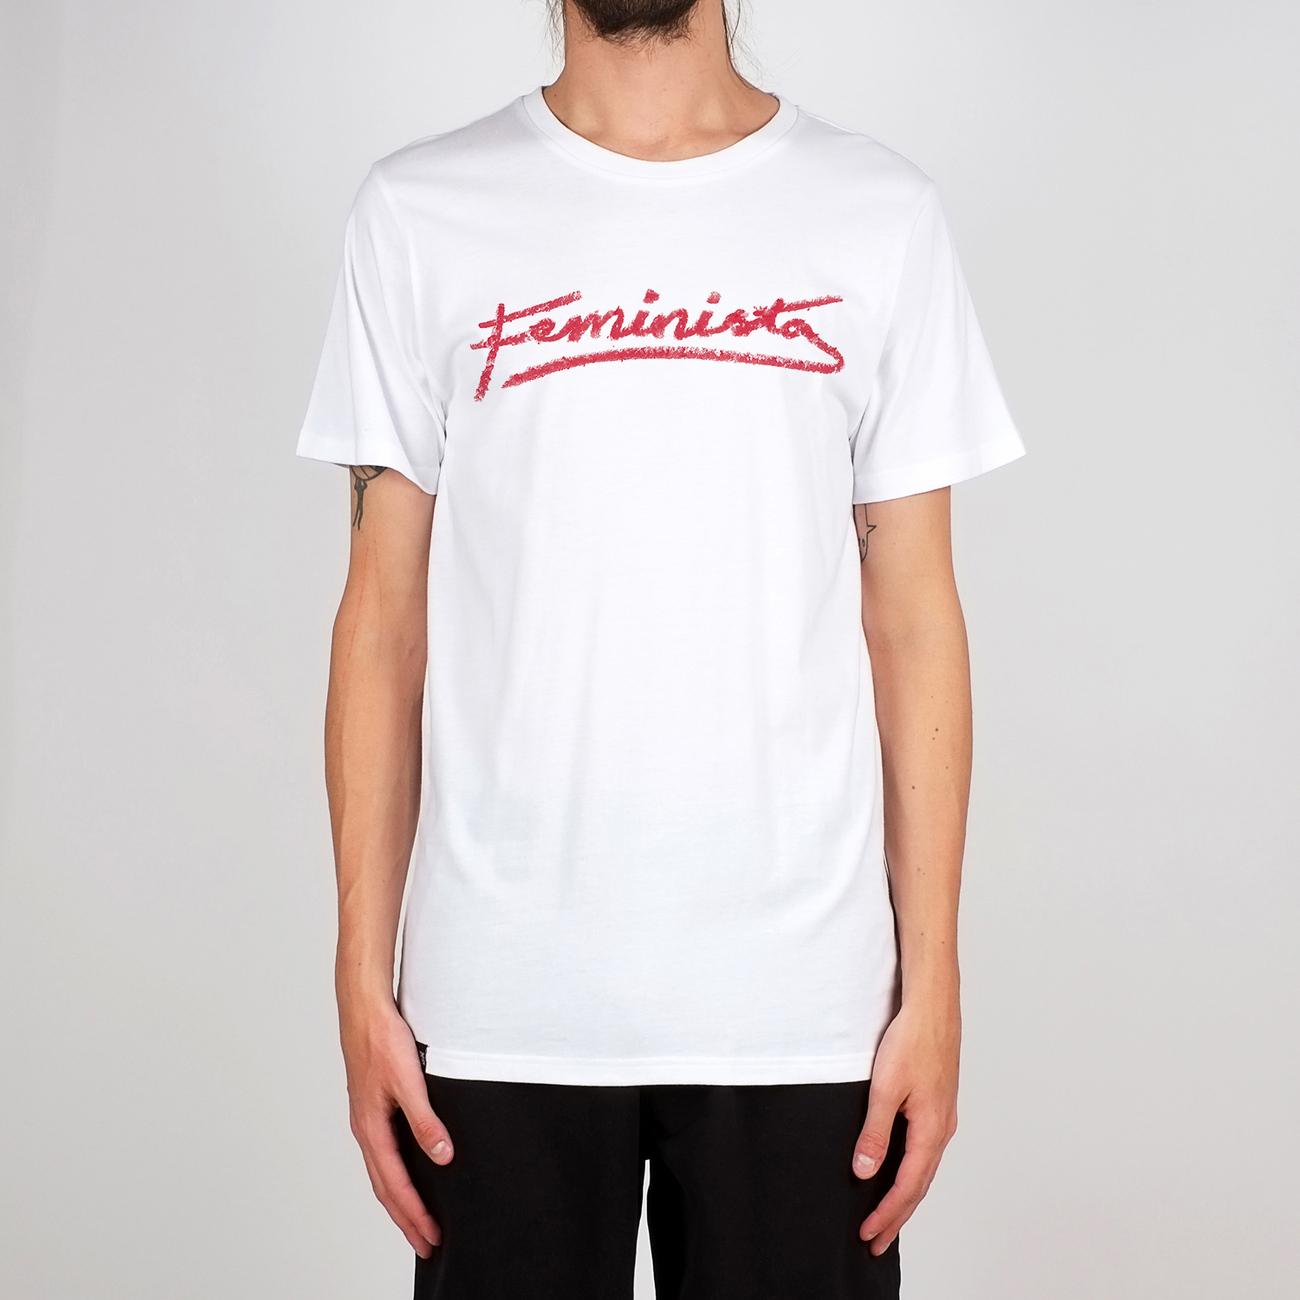 T-shirt Stockholm Feminista